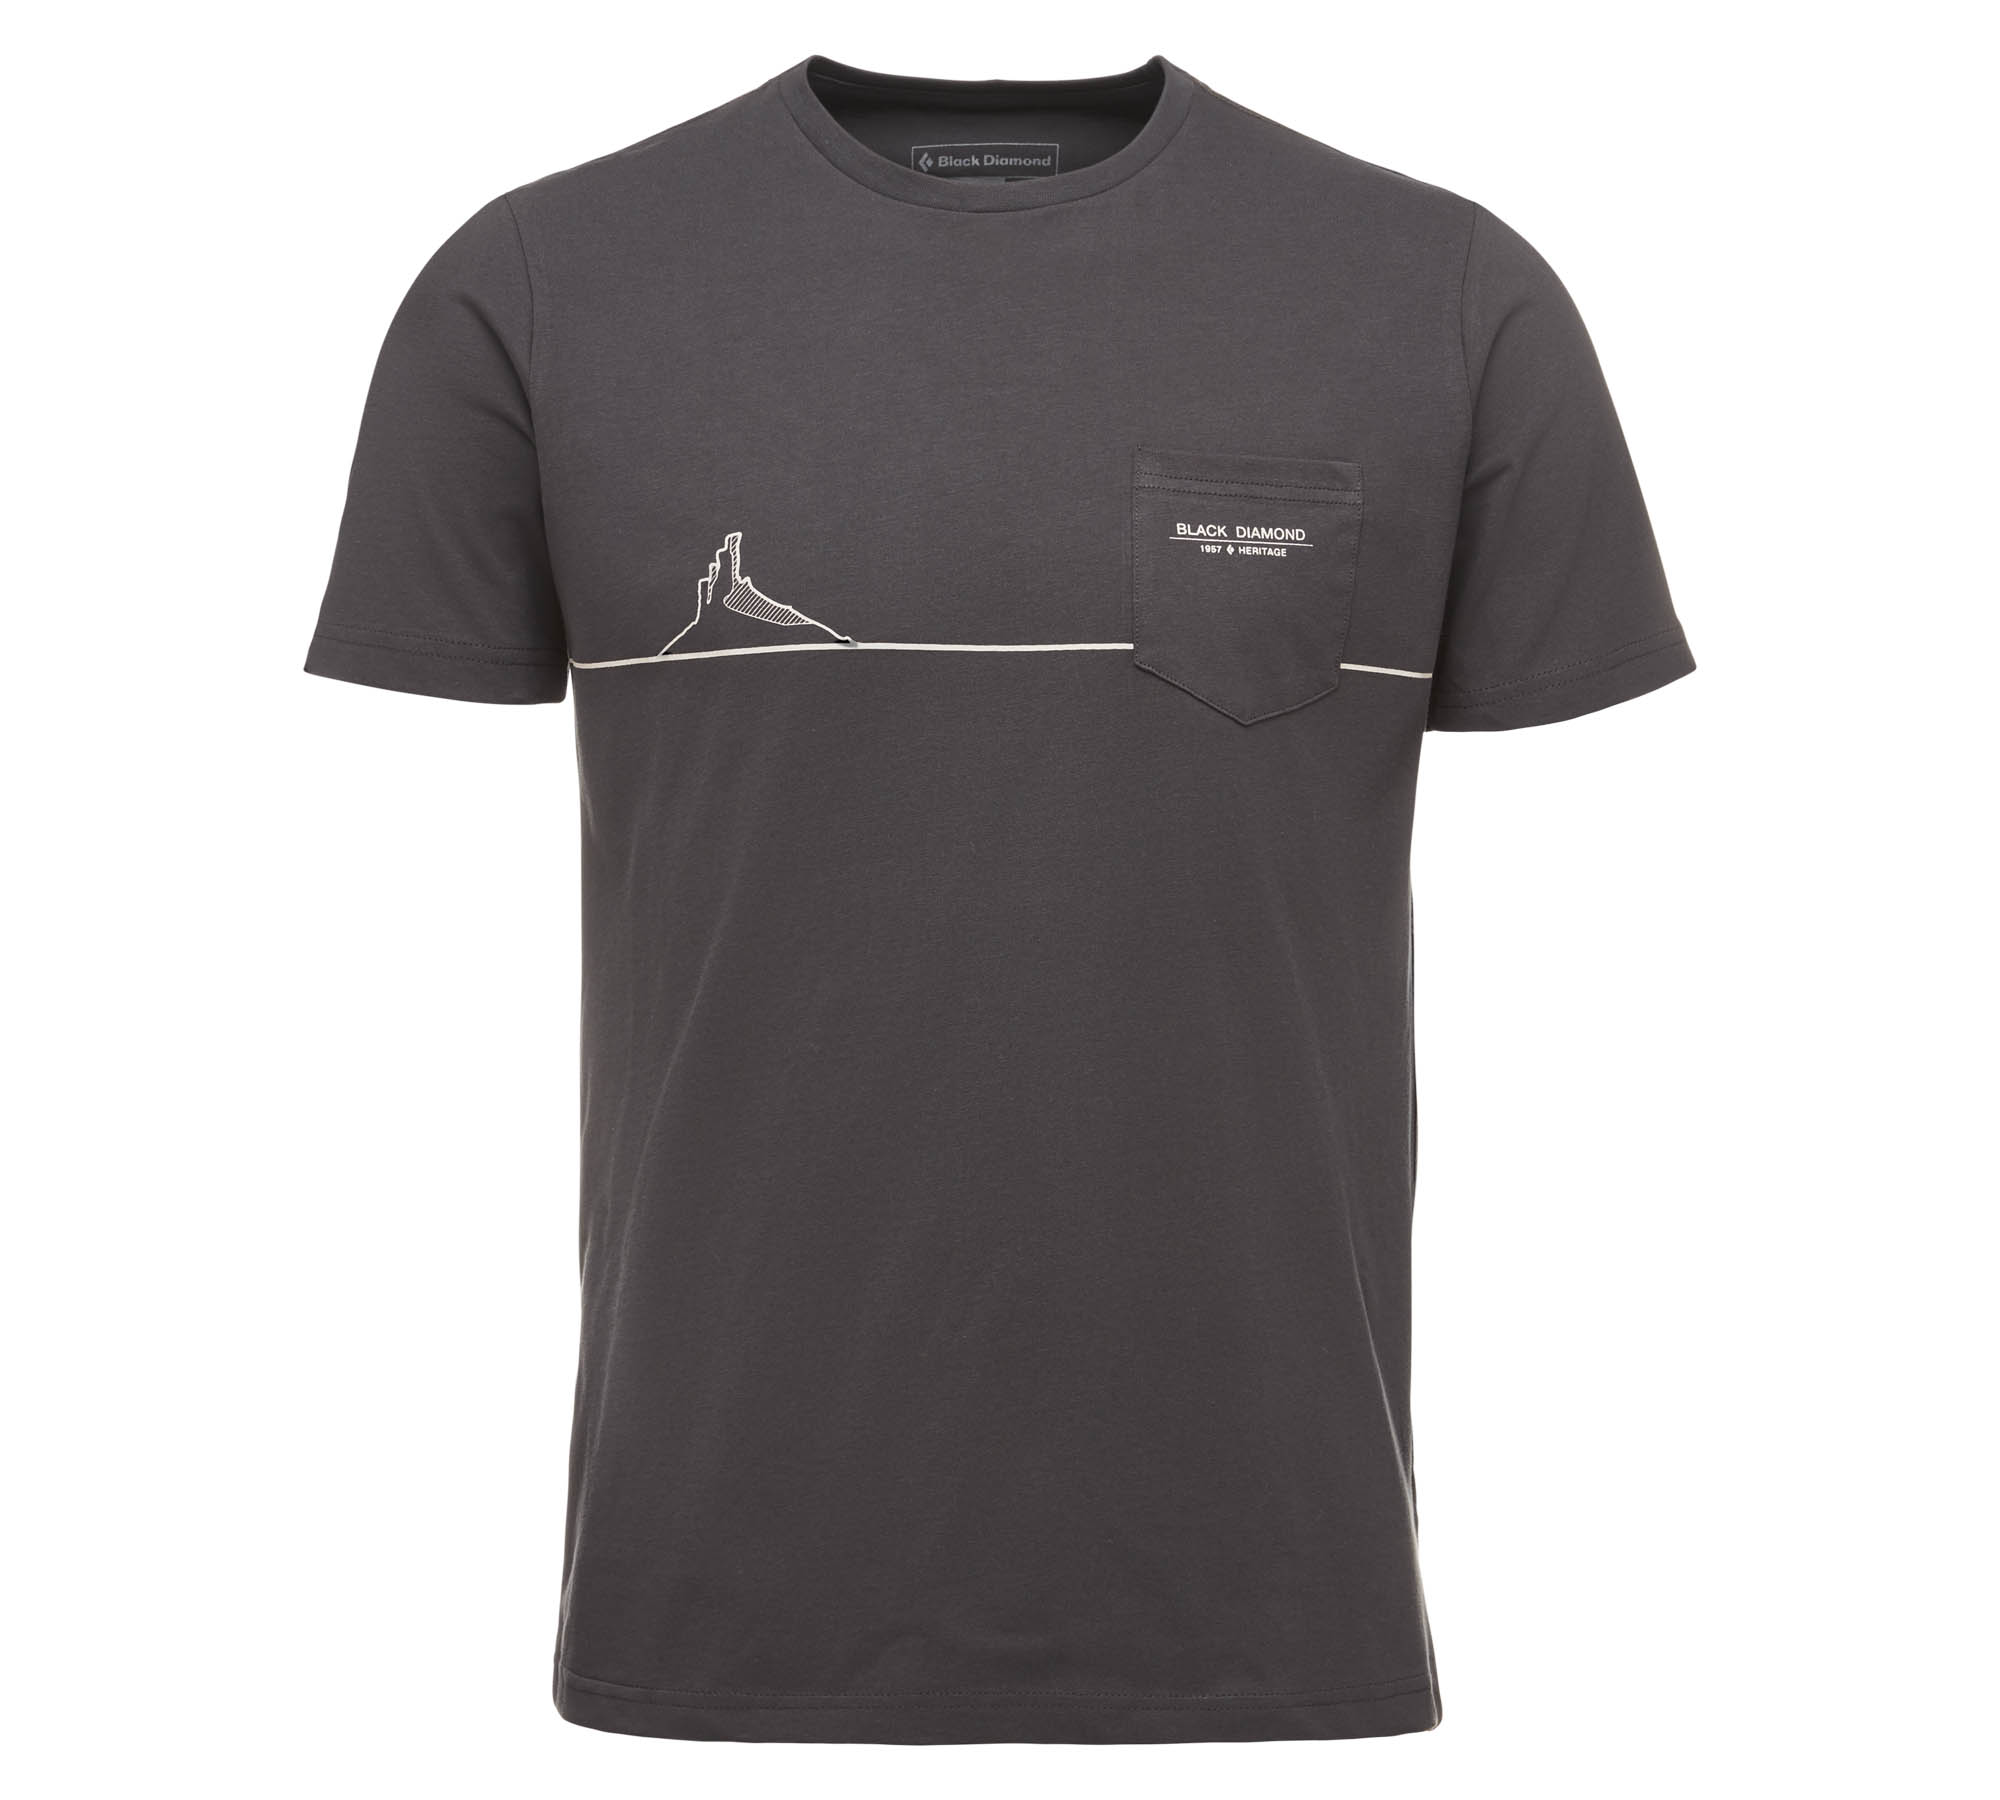 Black Diamond Tower Shirt carbon